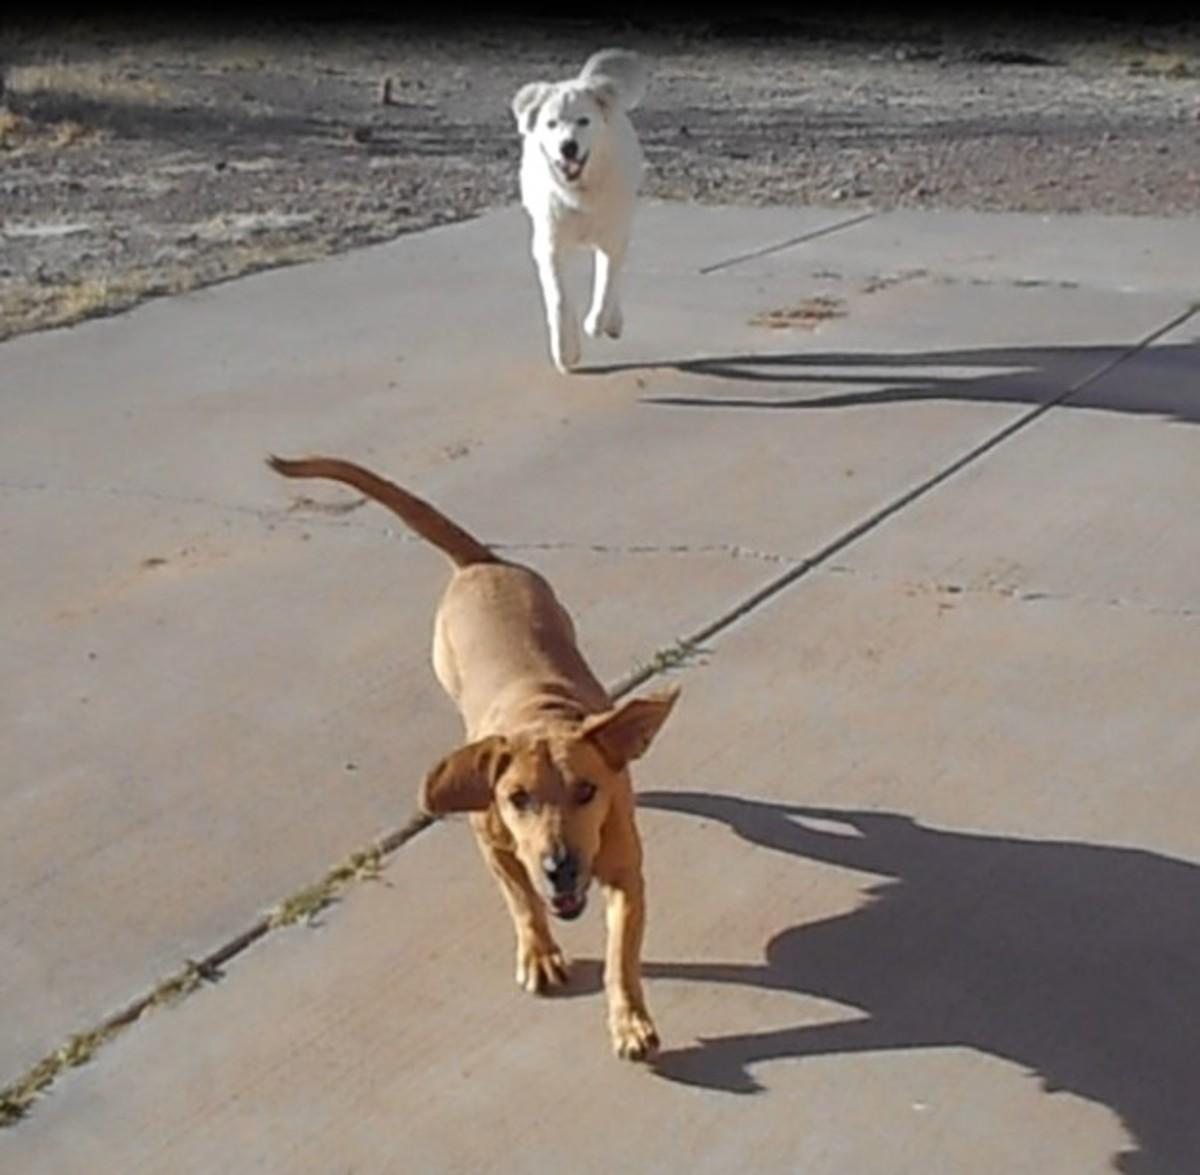 Dogs barking in the yard